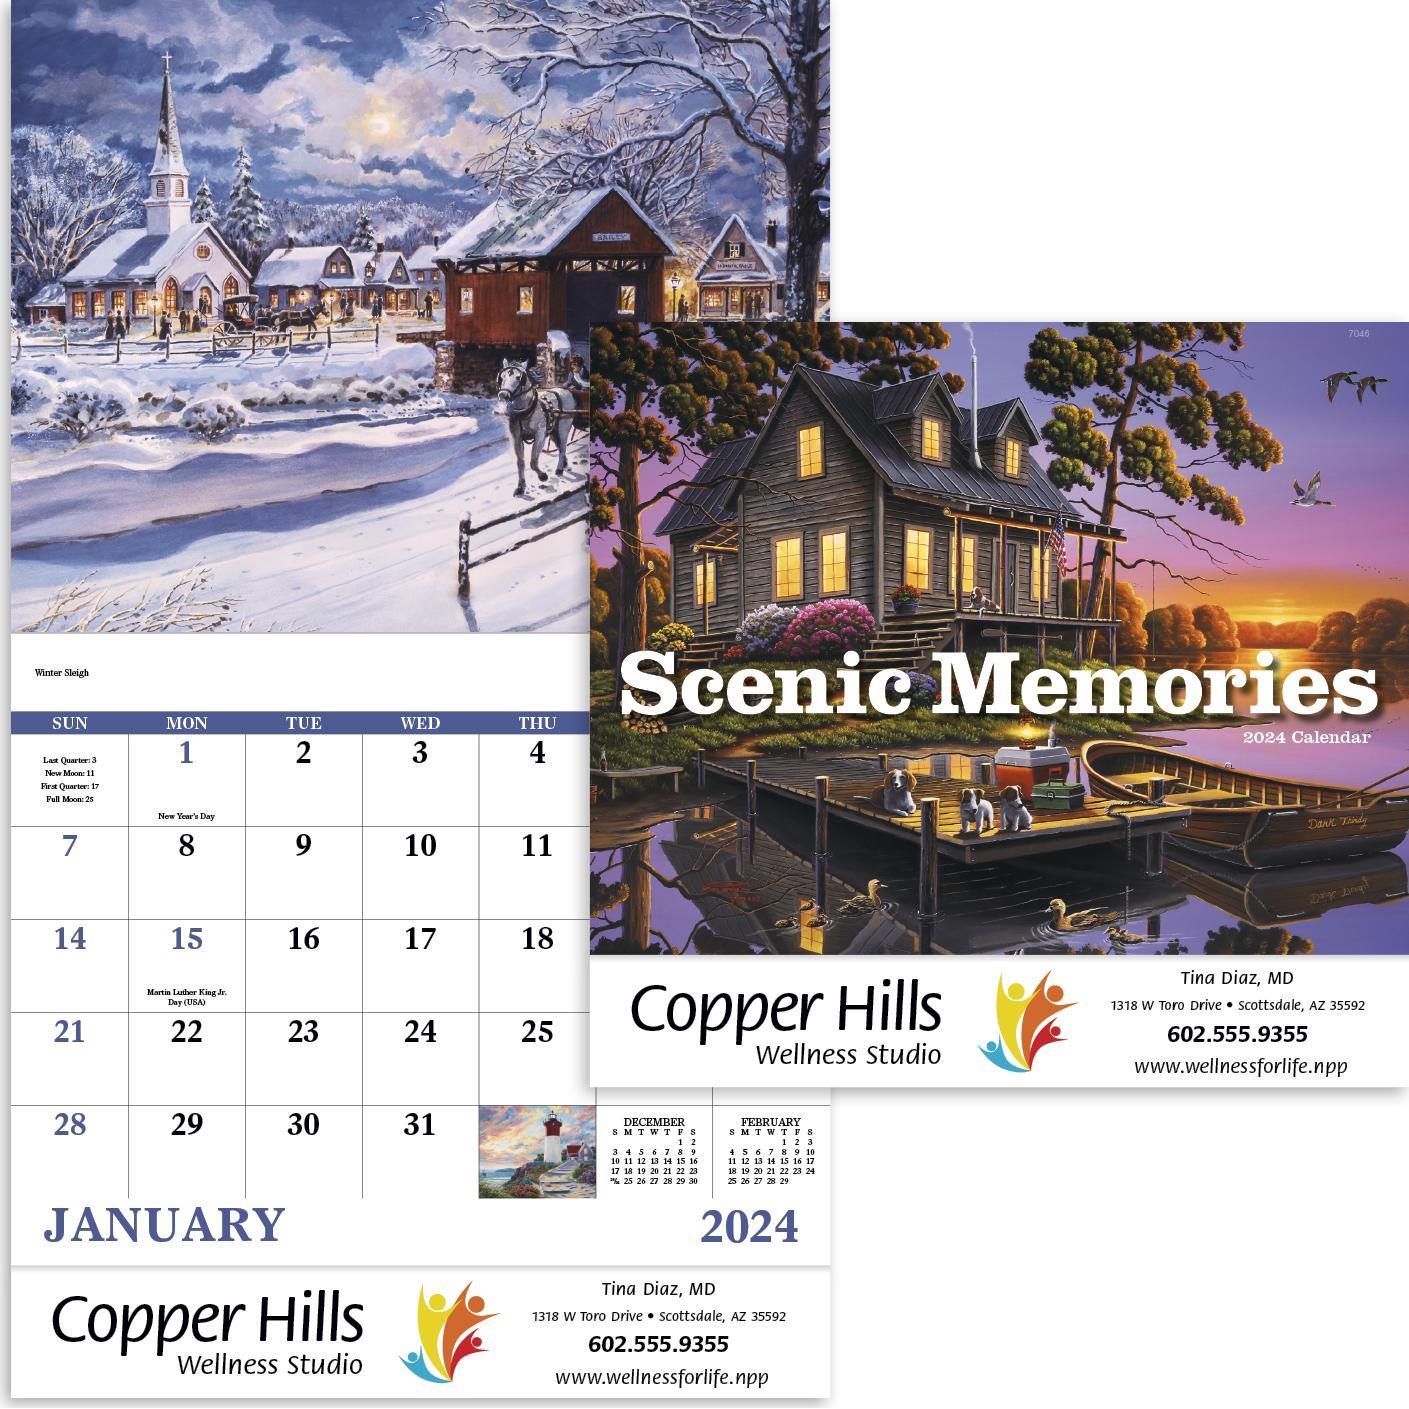 Scenic Memories Calendar (Stapled)